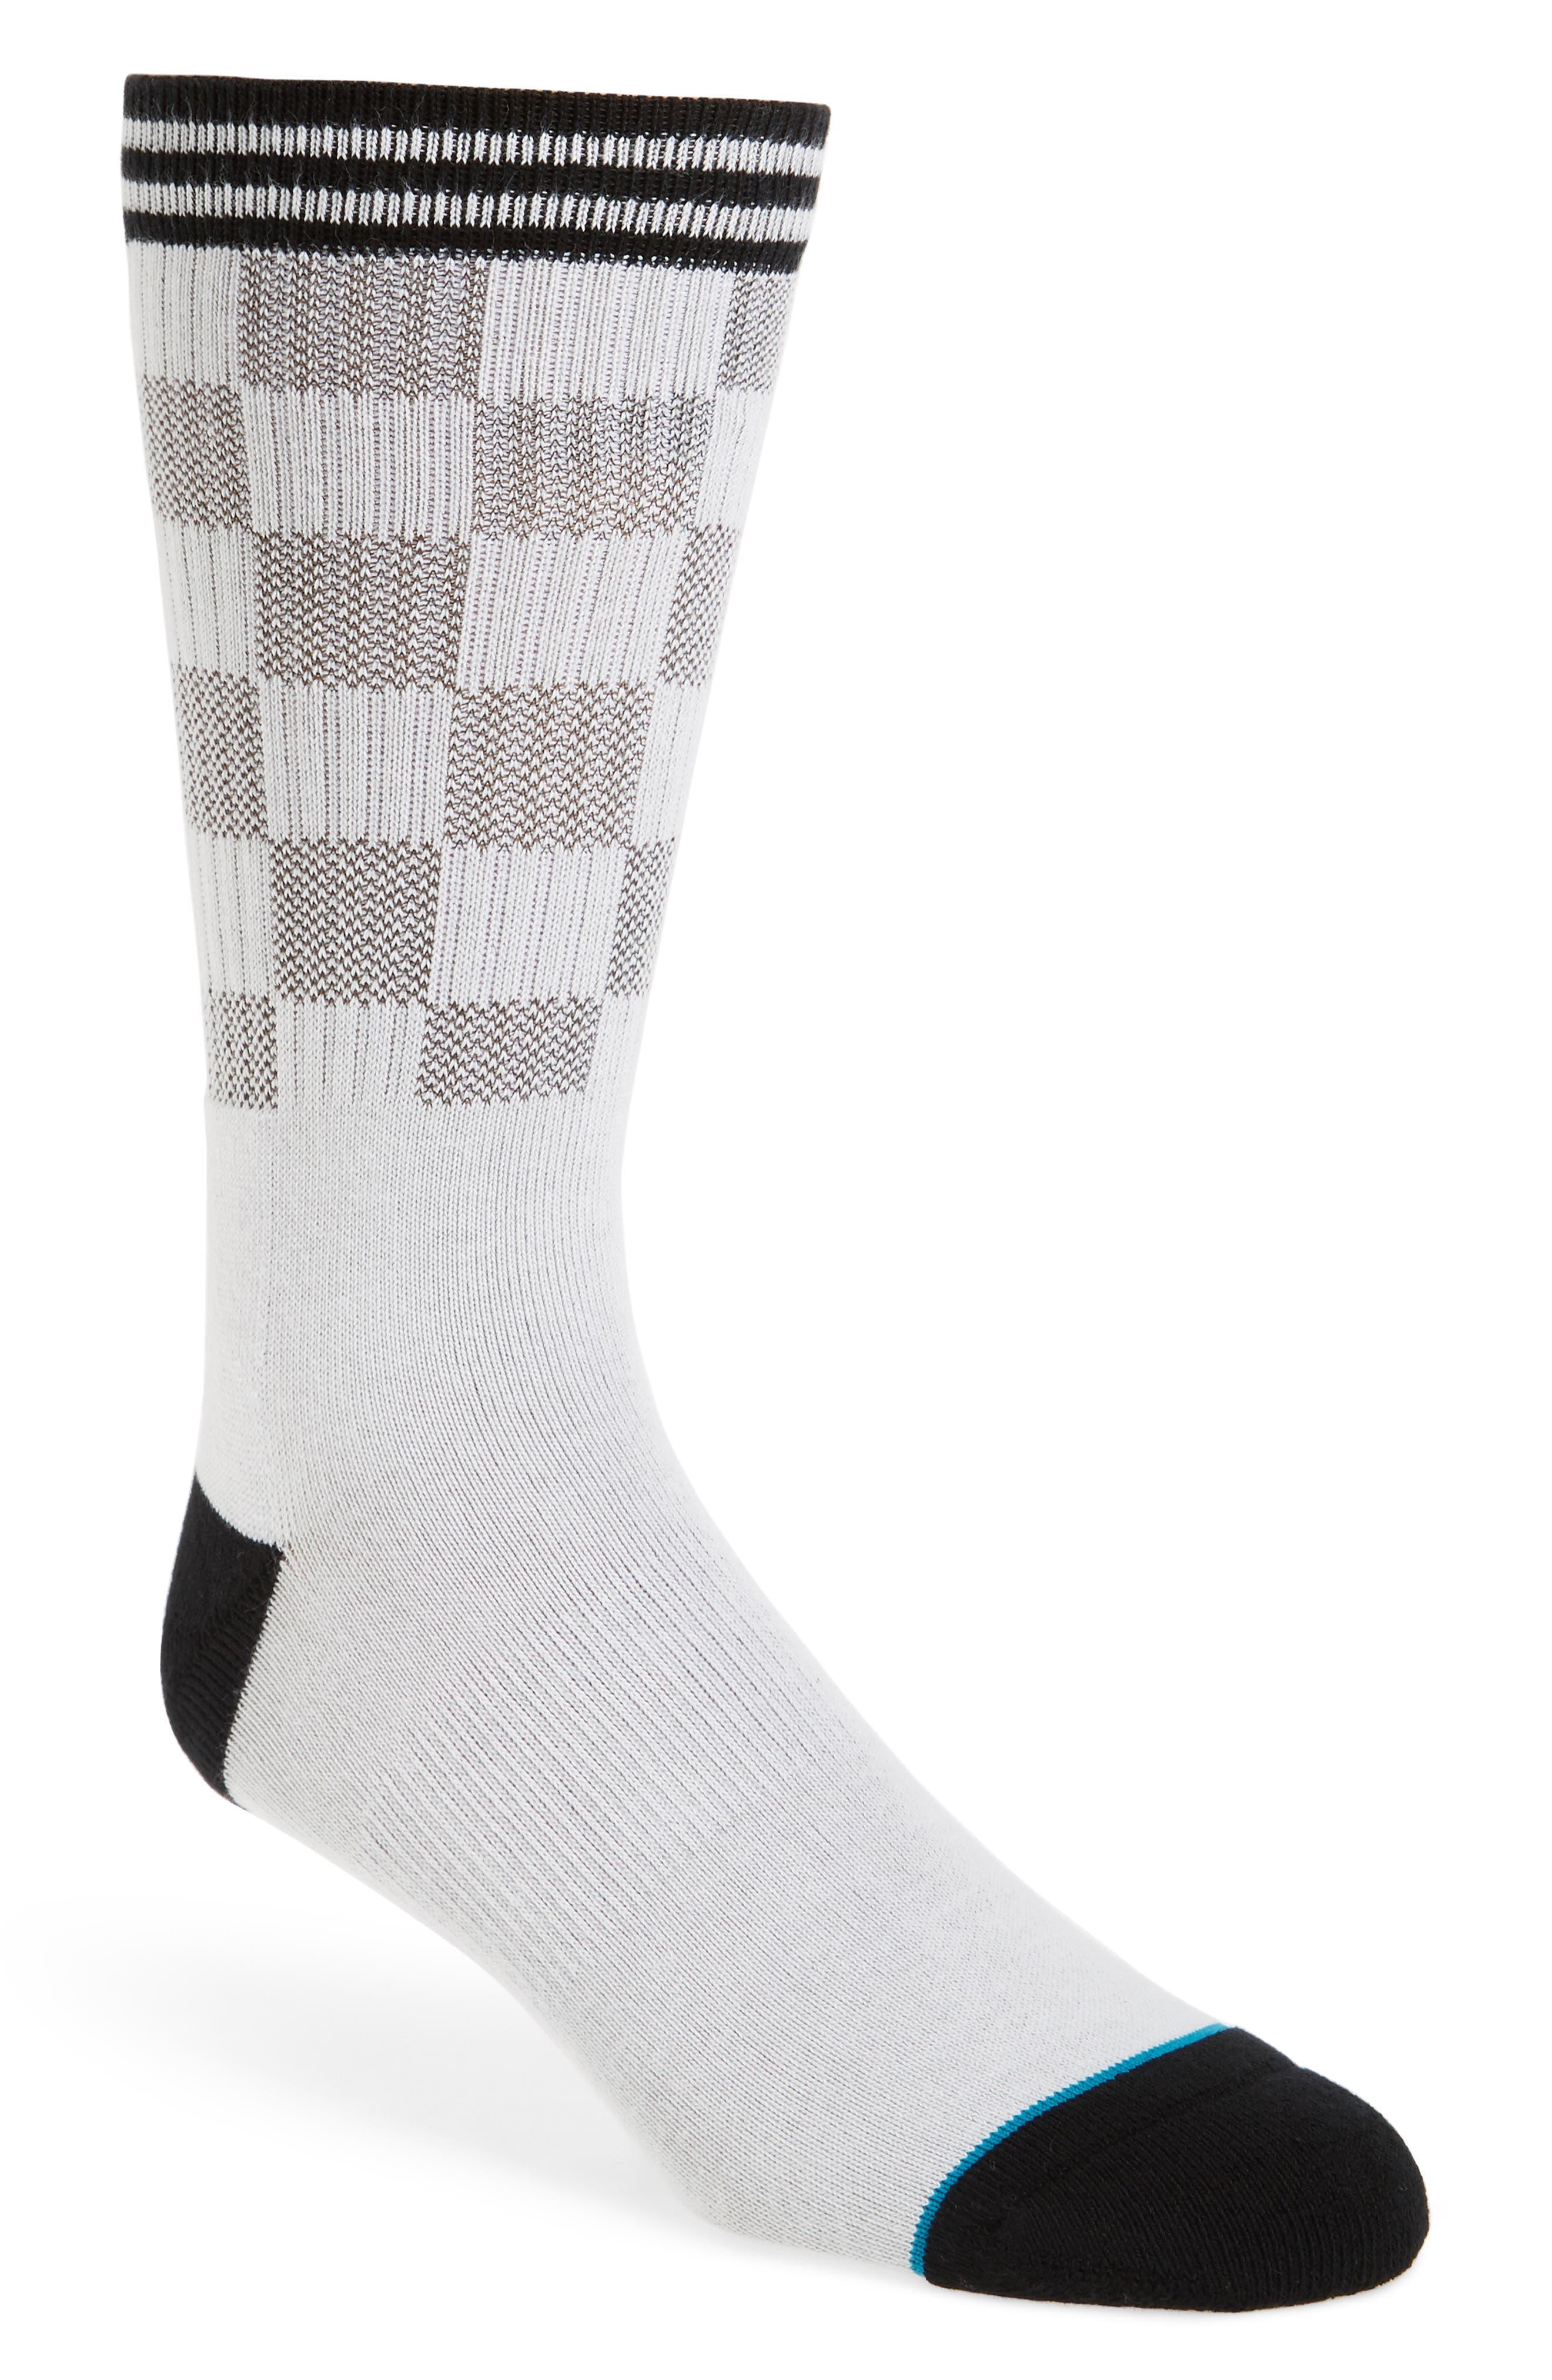 Caged Socks,                             Main thumbnail 1, color,                             WHITE